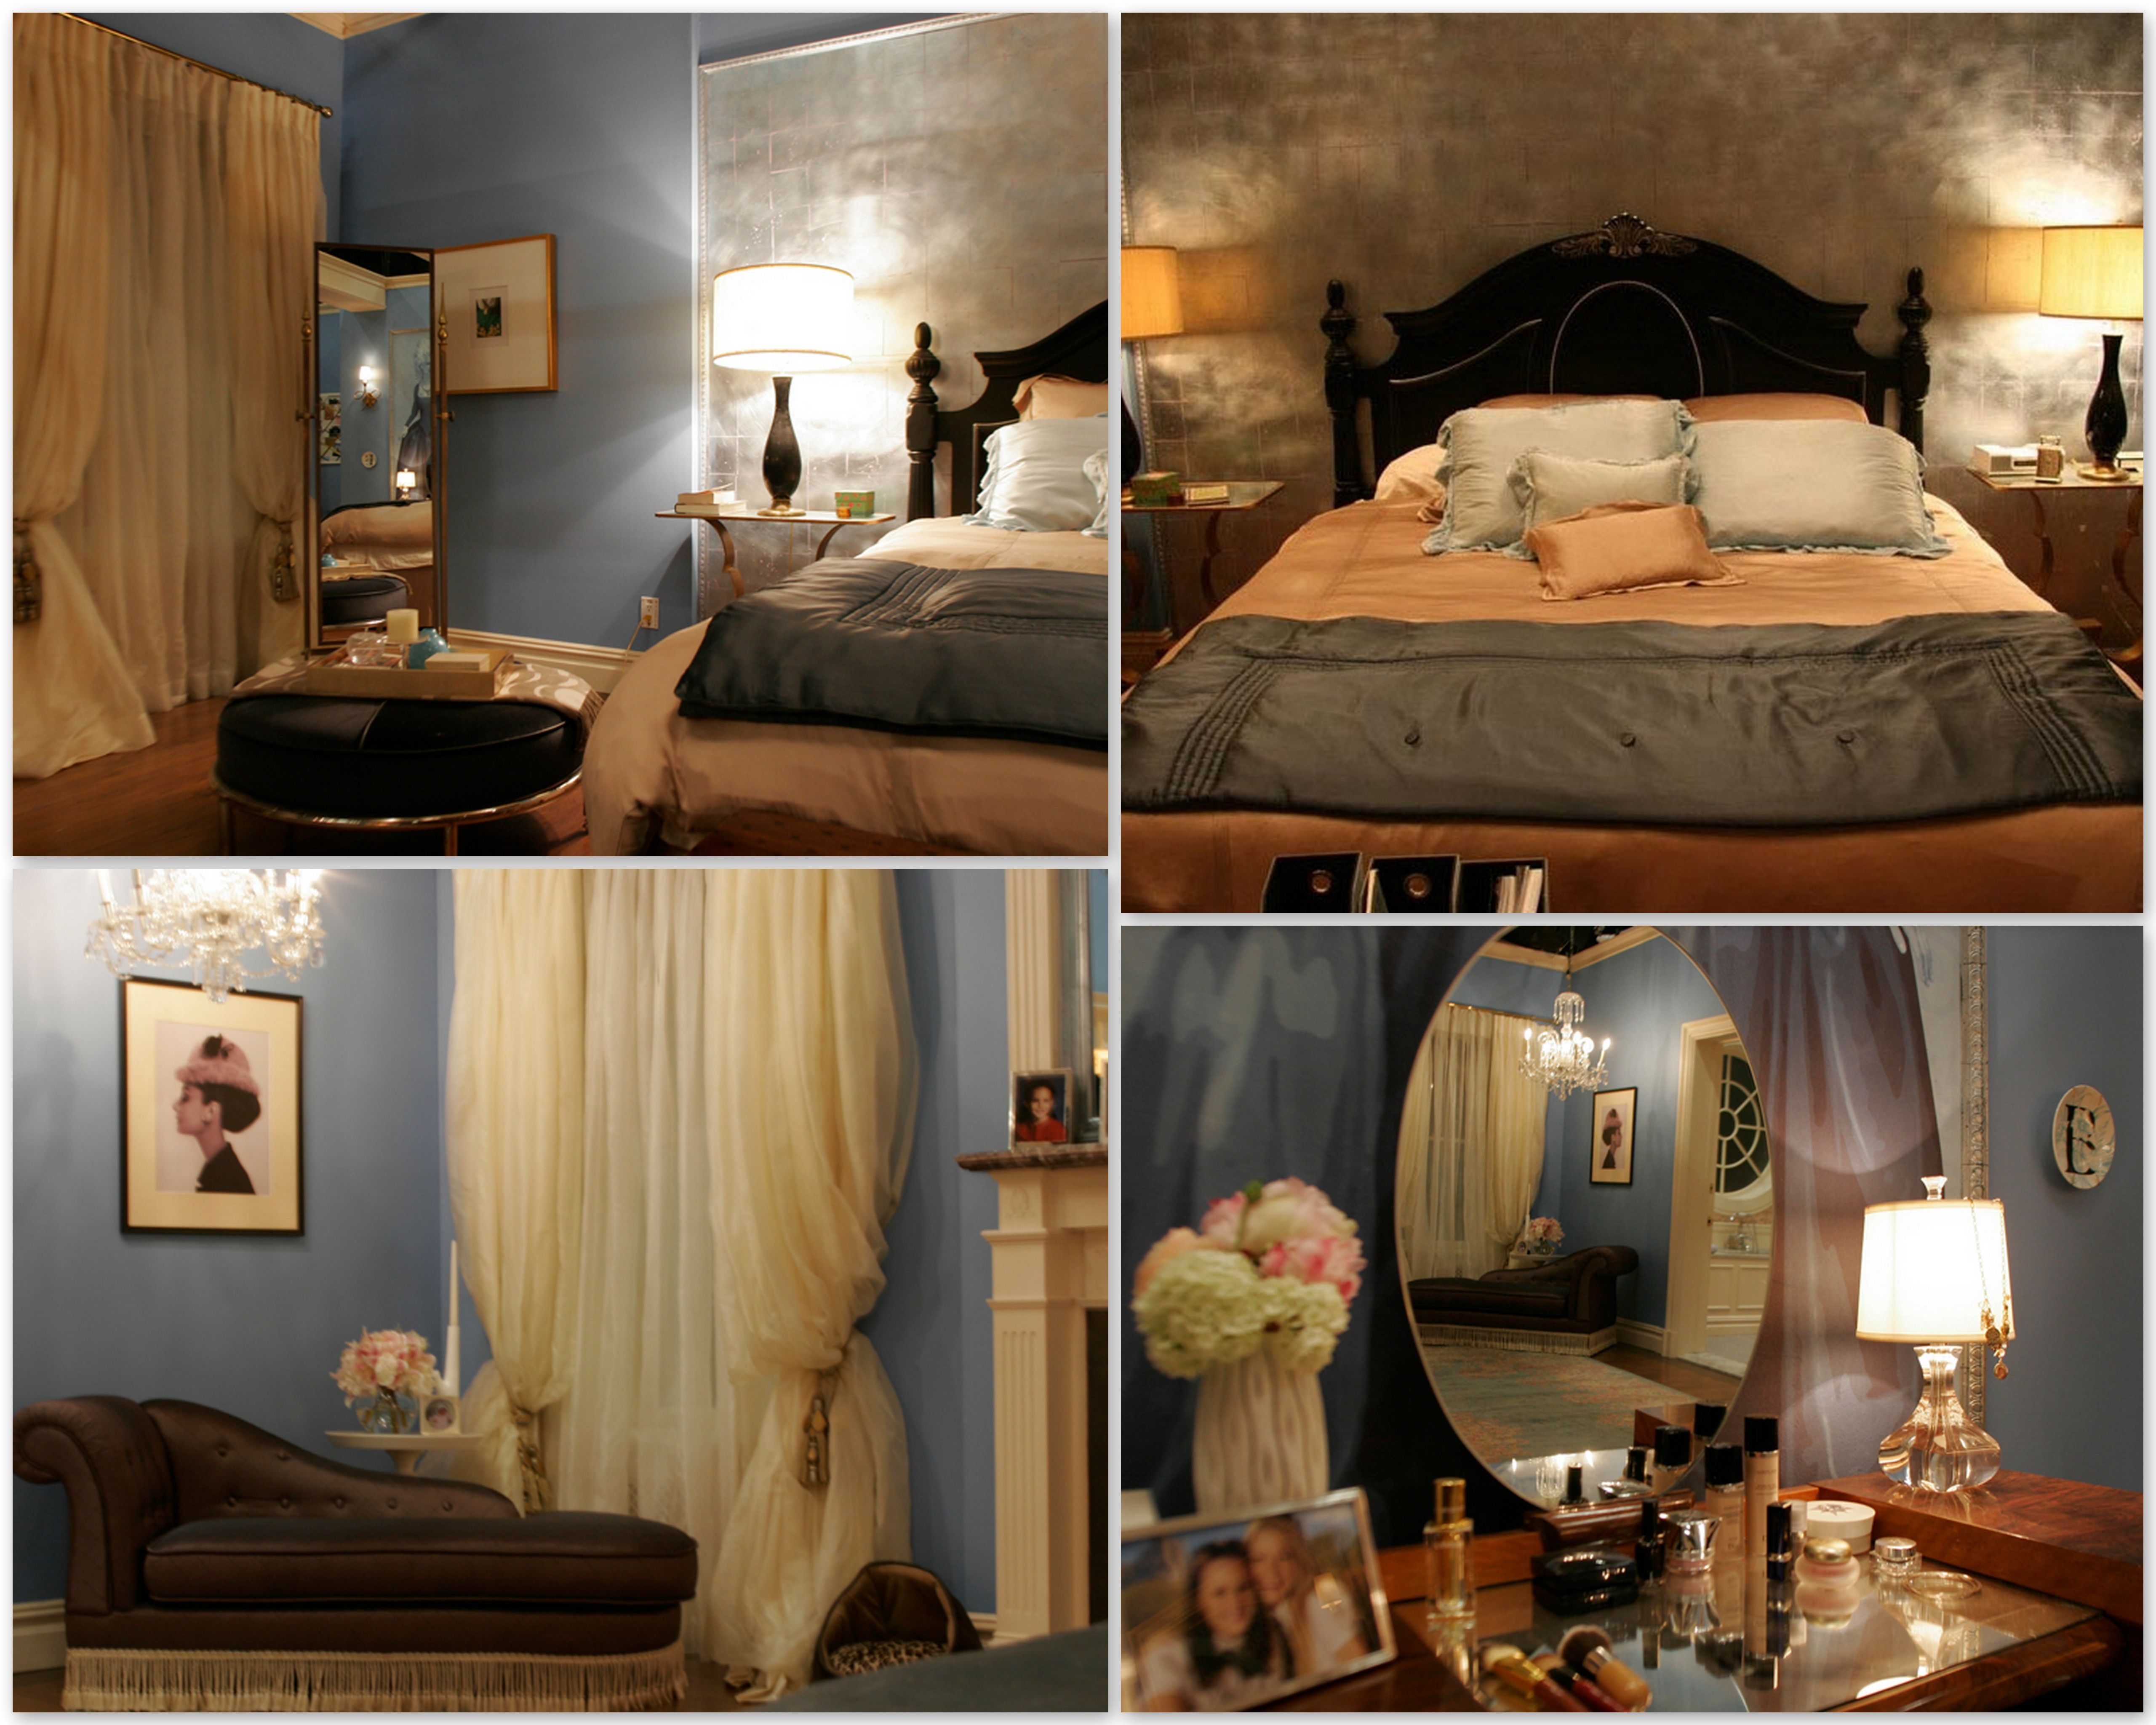 Blair S Room I M Moving In Blair Waldorf Bedroom Gossip Girl Decor Waldorf Bedroom